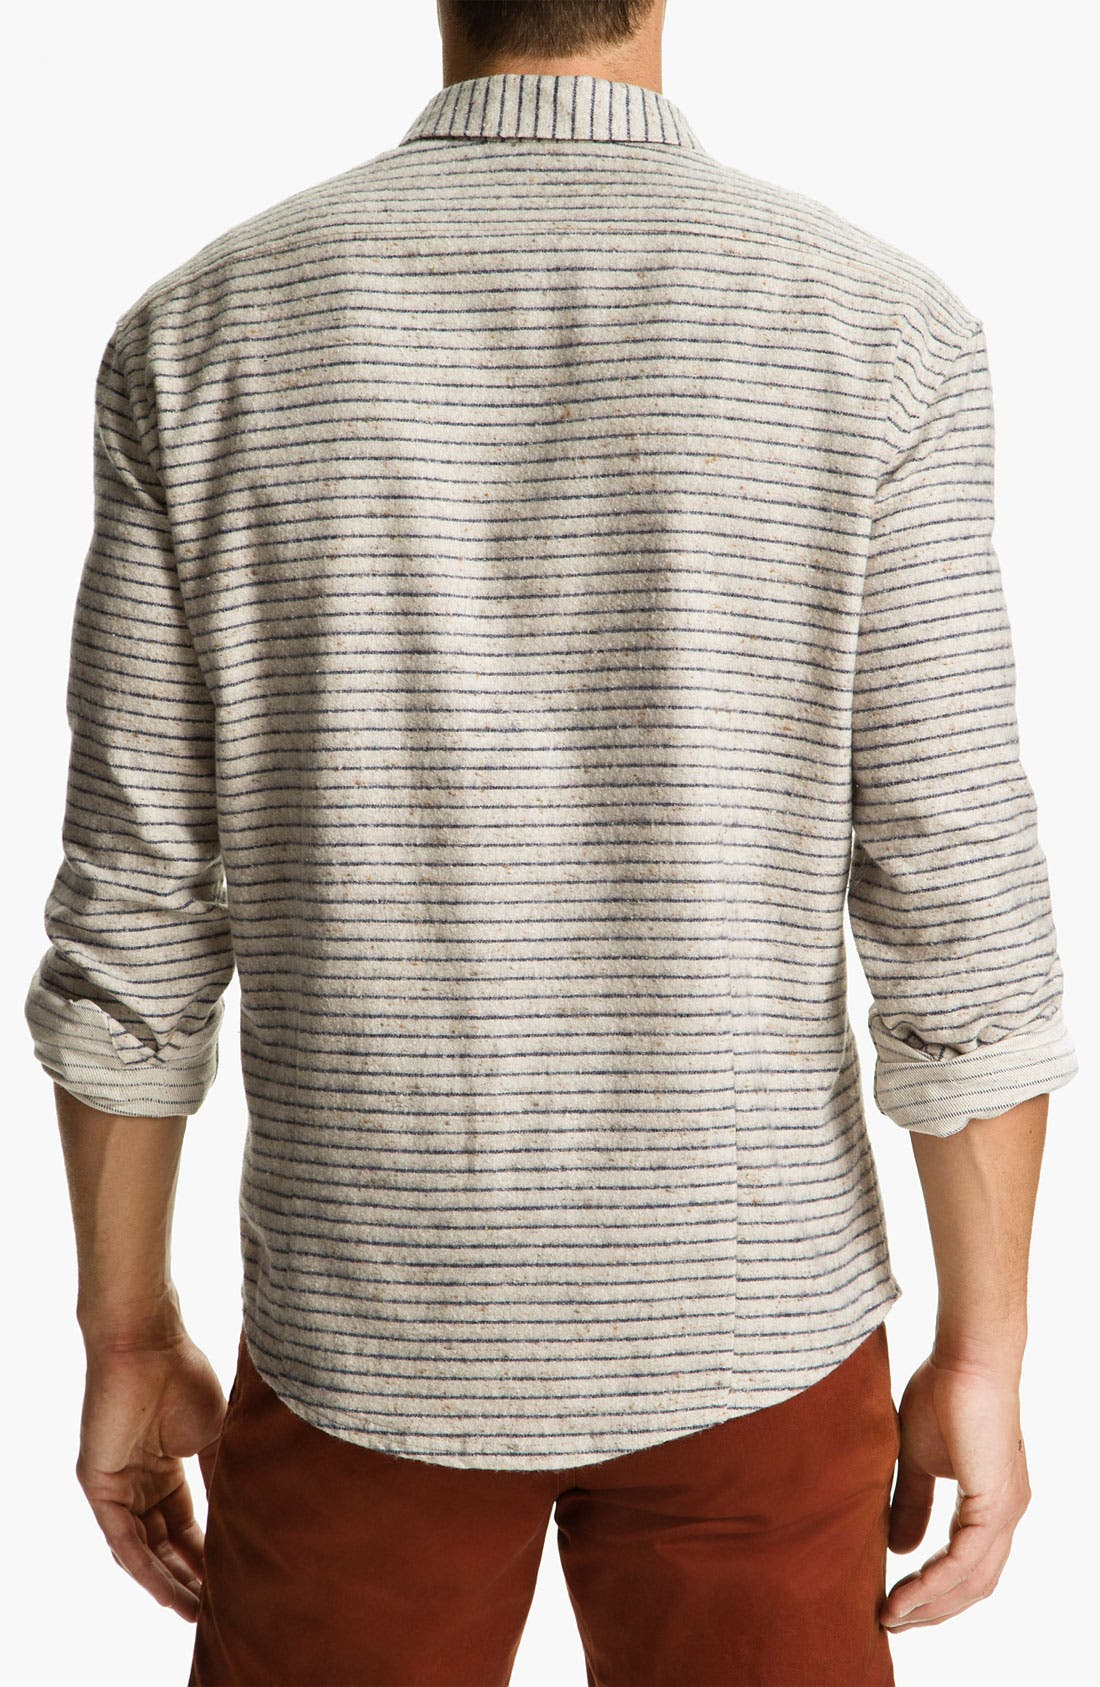 Alternate Image 2  - Riviera Club 'Tonic' Stripe Woven Shirt